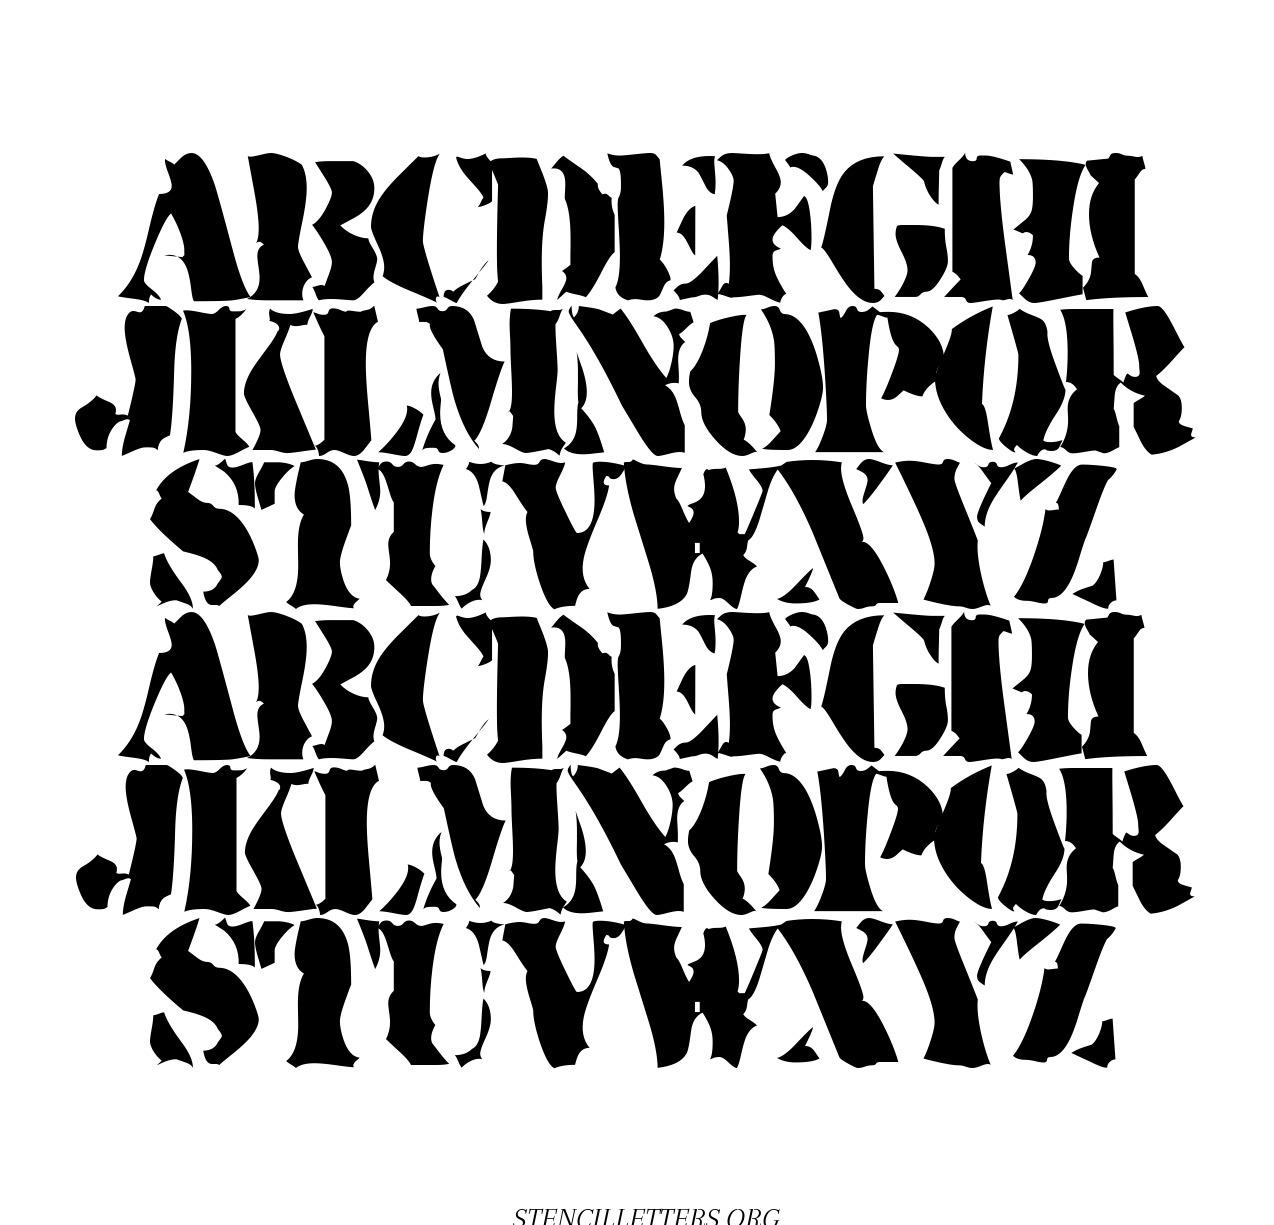 Army Stencil Majuscule free printable letter stencils